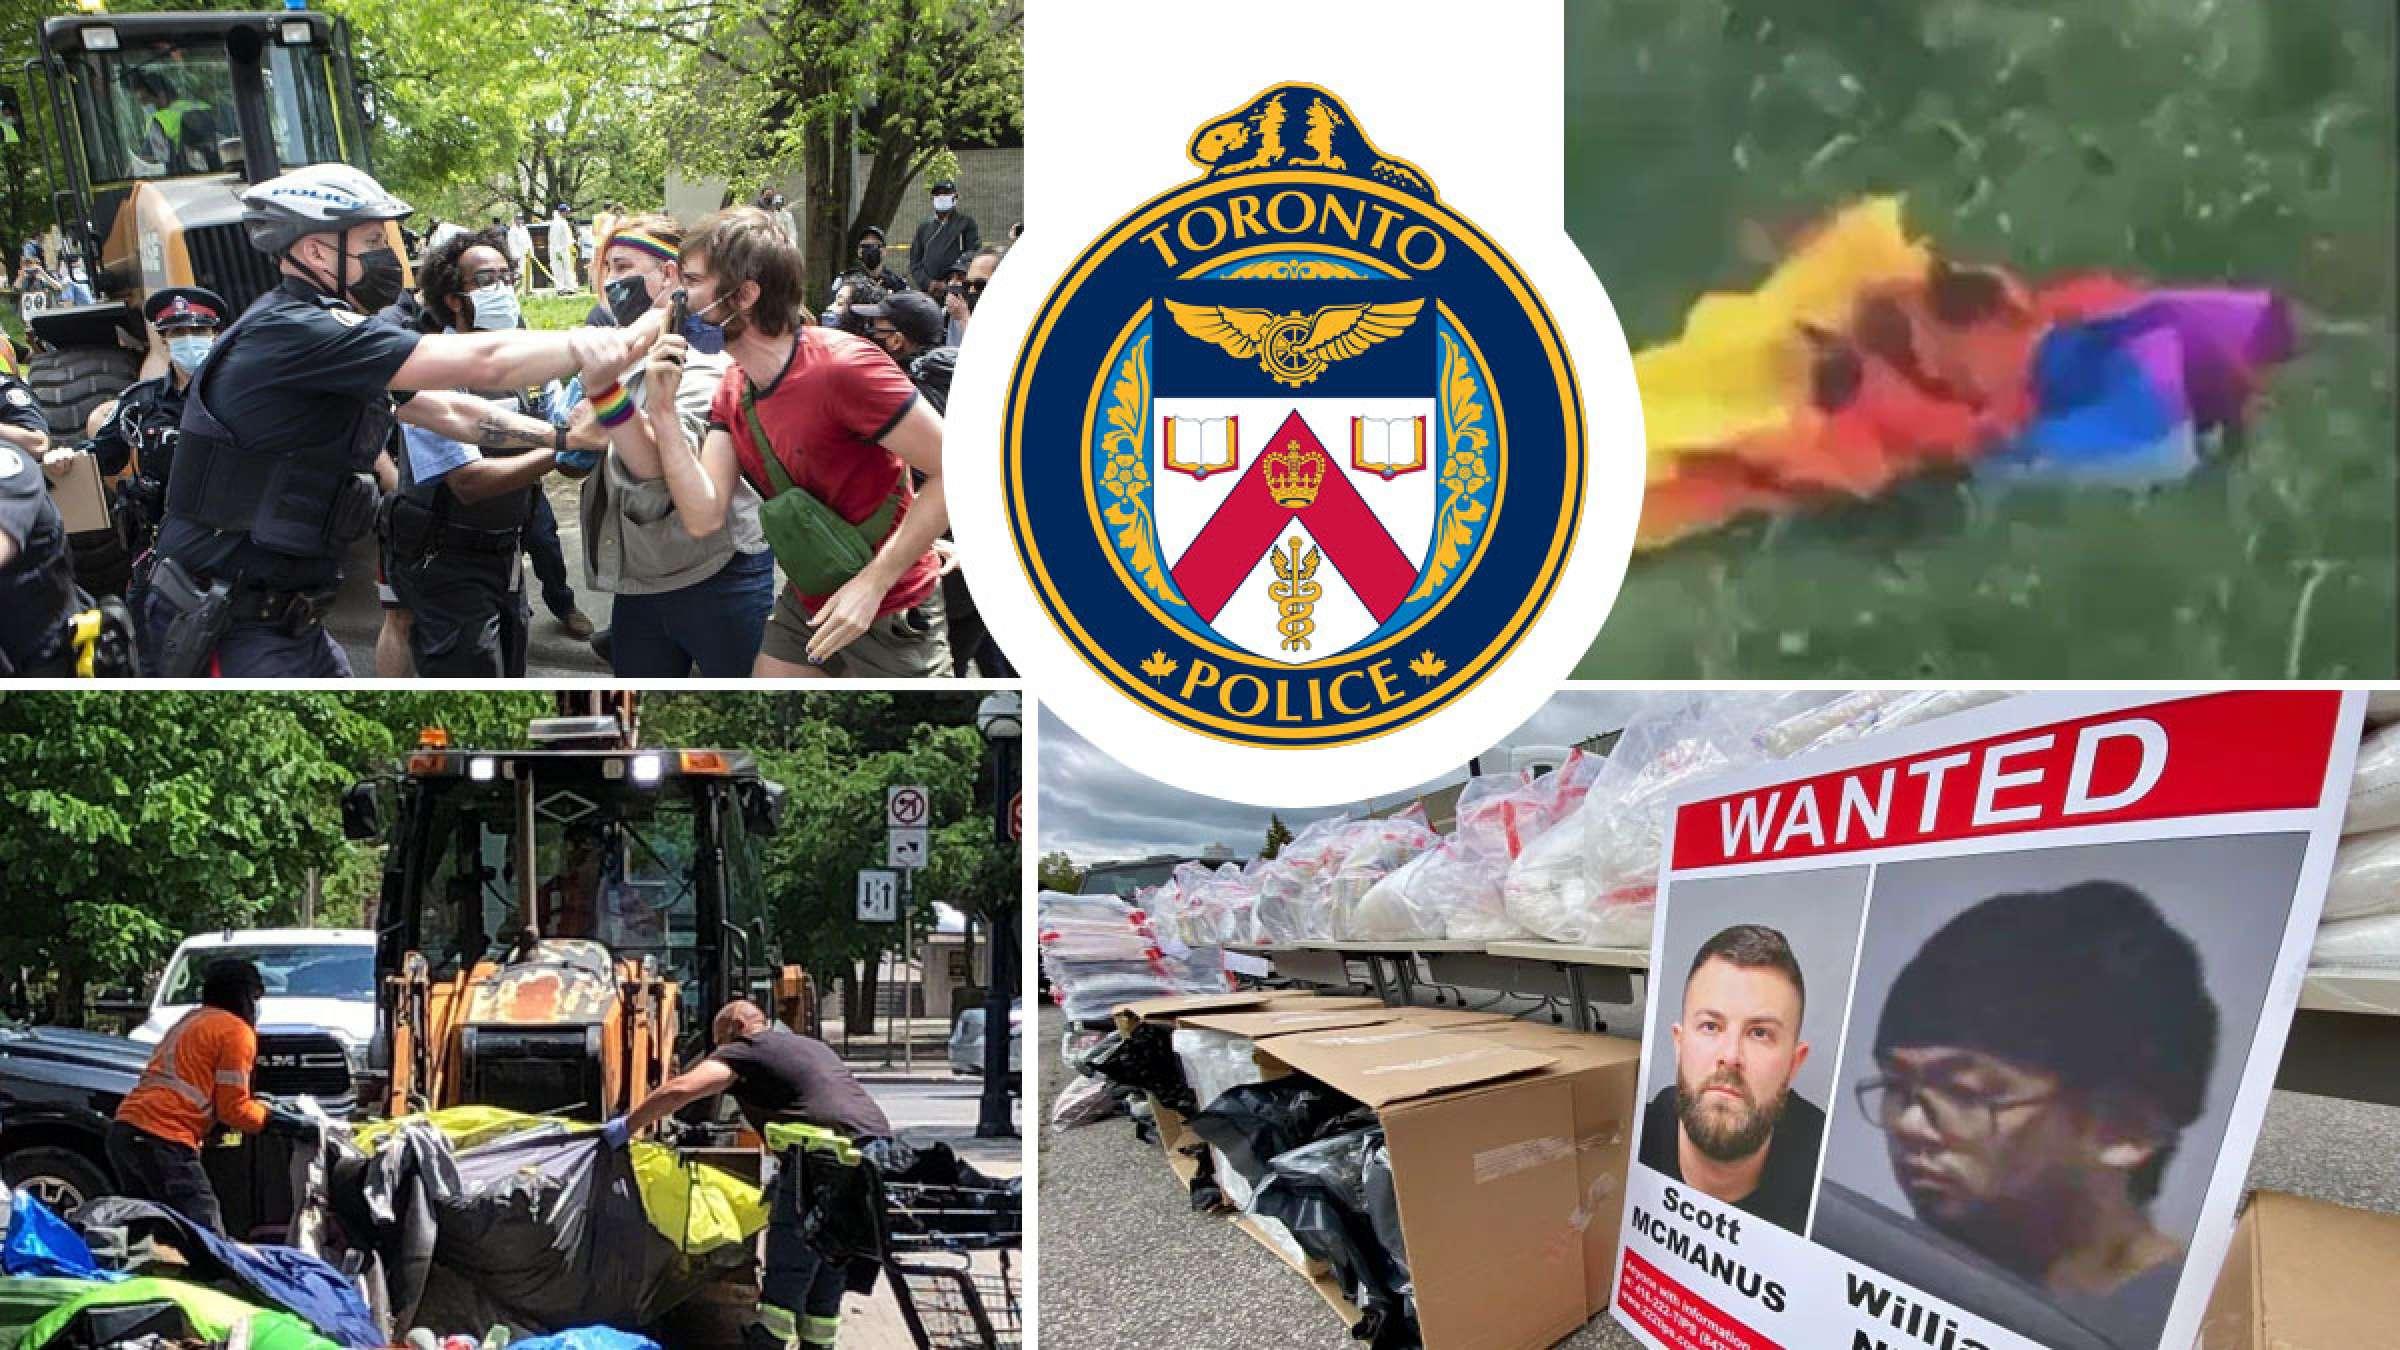 خبر-تورنتو-پلیس-بزرگترین-محموله-قاچاق-مواد-مخدر-دو-نوجوان-آتش-پرچم-همجنسگراها-اخراج-بی-خانمان